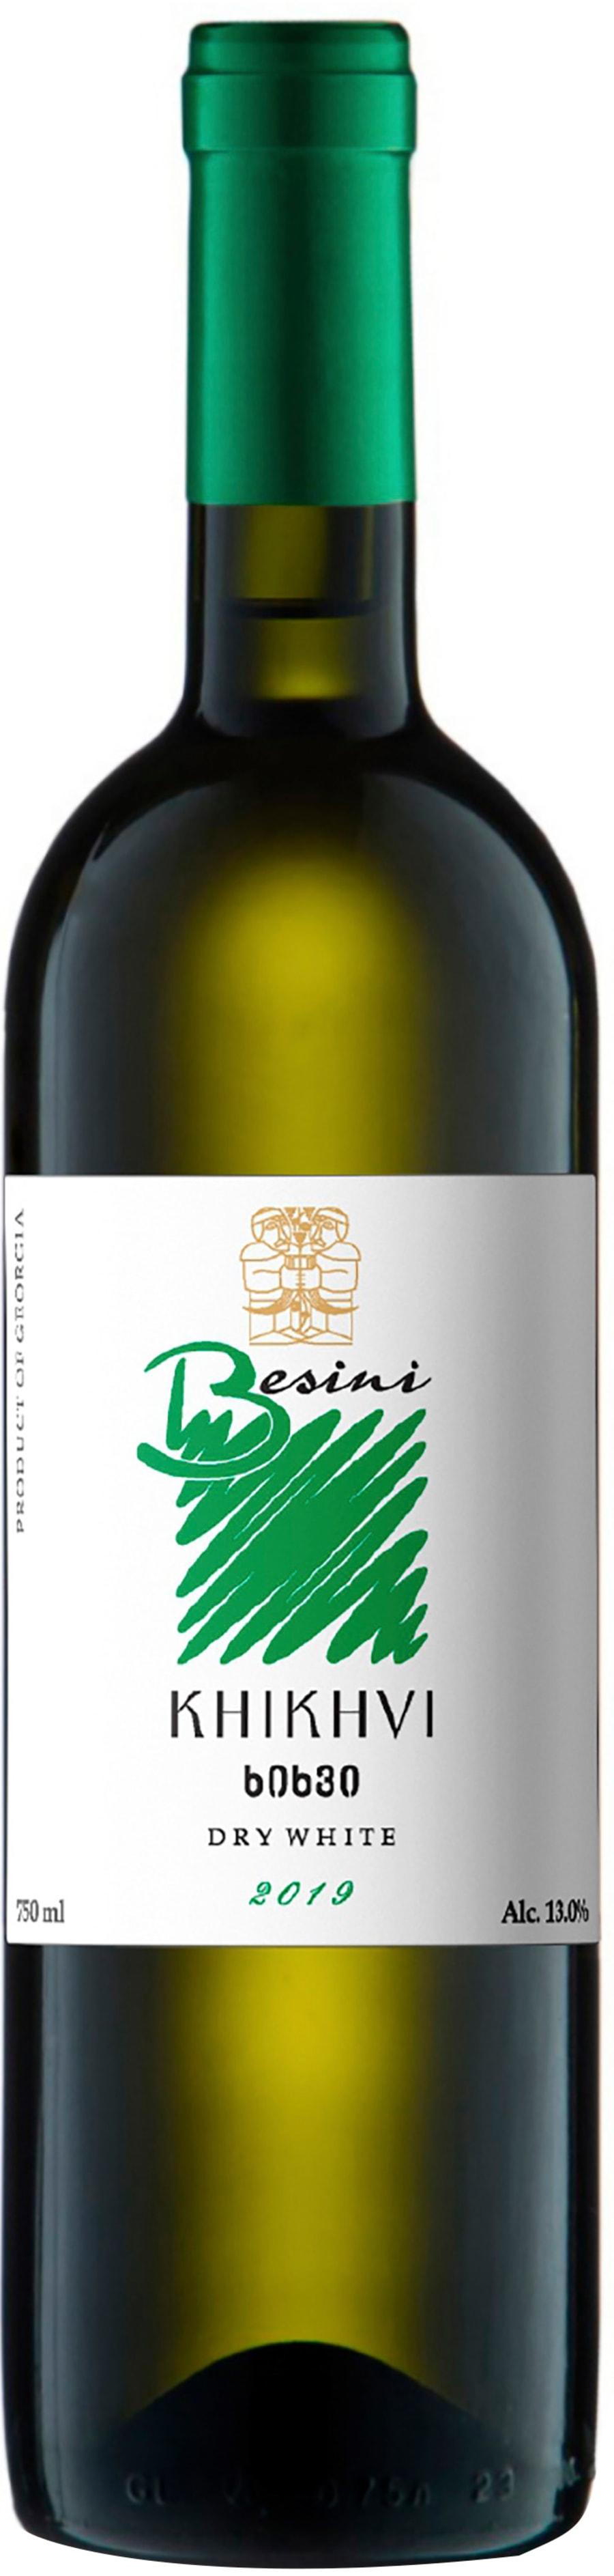 white wine, Dry, medium dry, medium sweet Helsinki